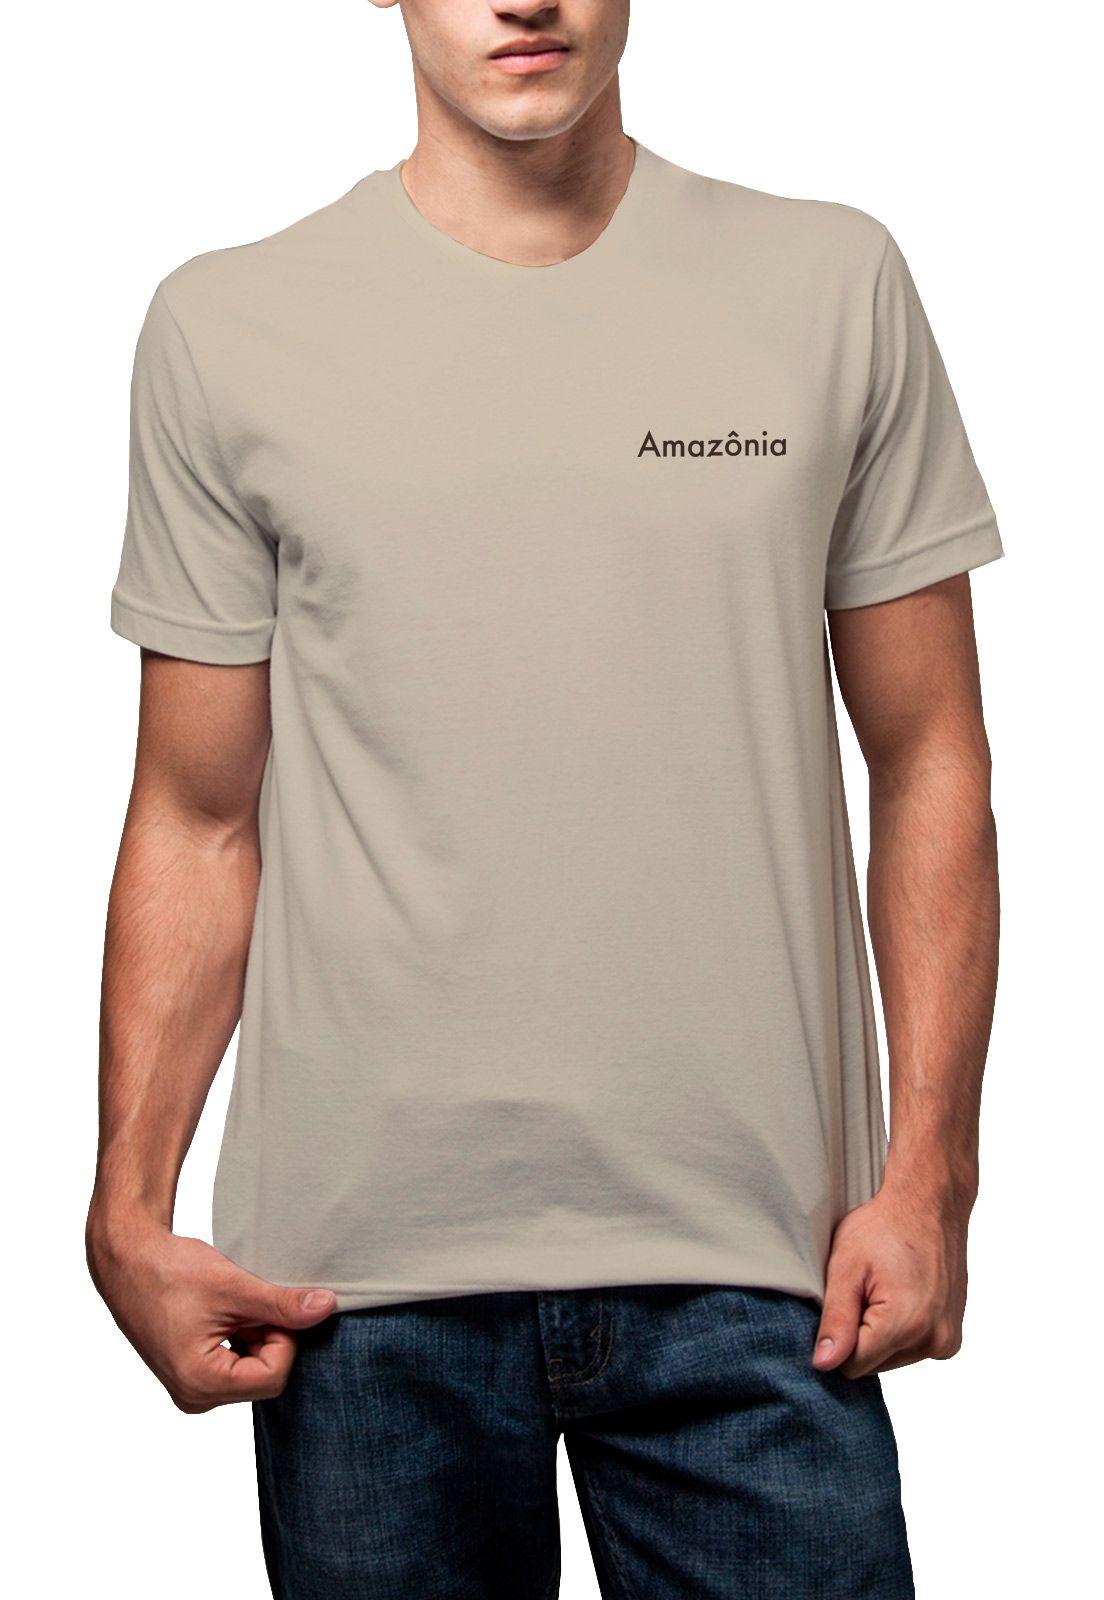 Camiseta Amazônia Índio Arco e Flecha - Bege